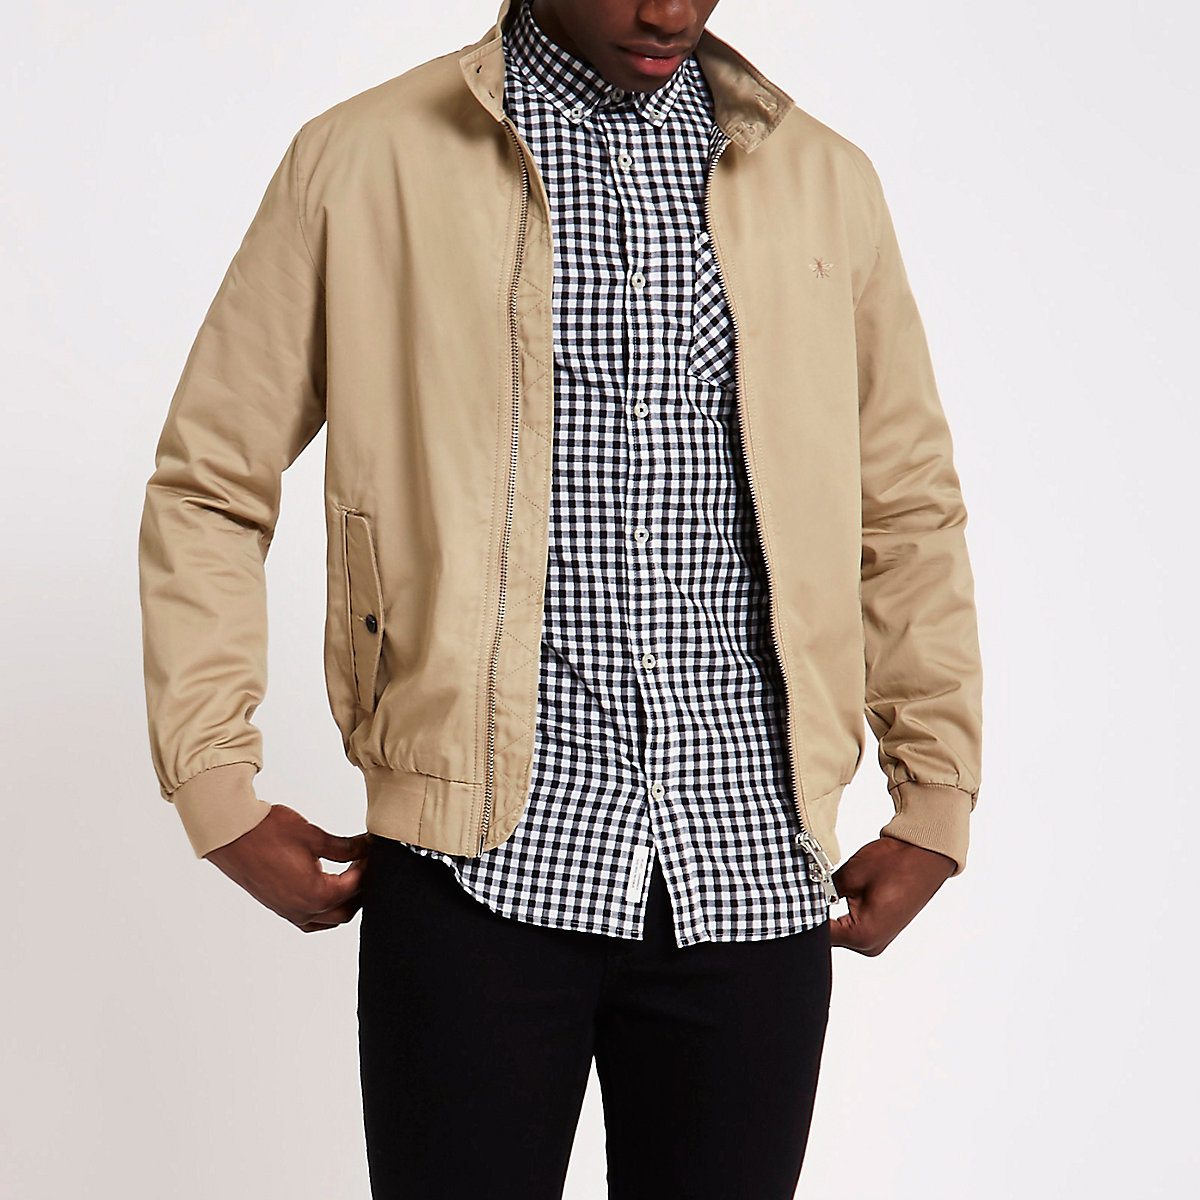 Stone embroidered harrington jacket